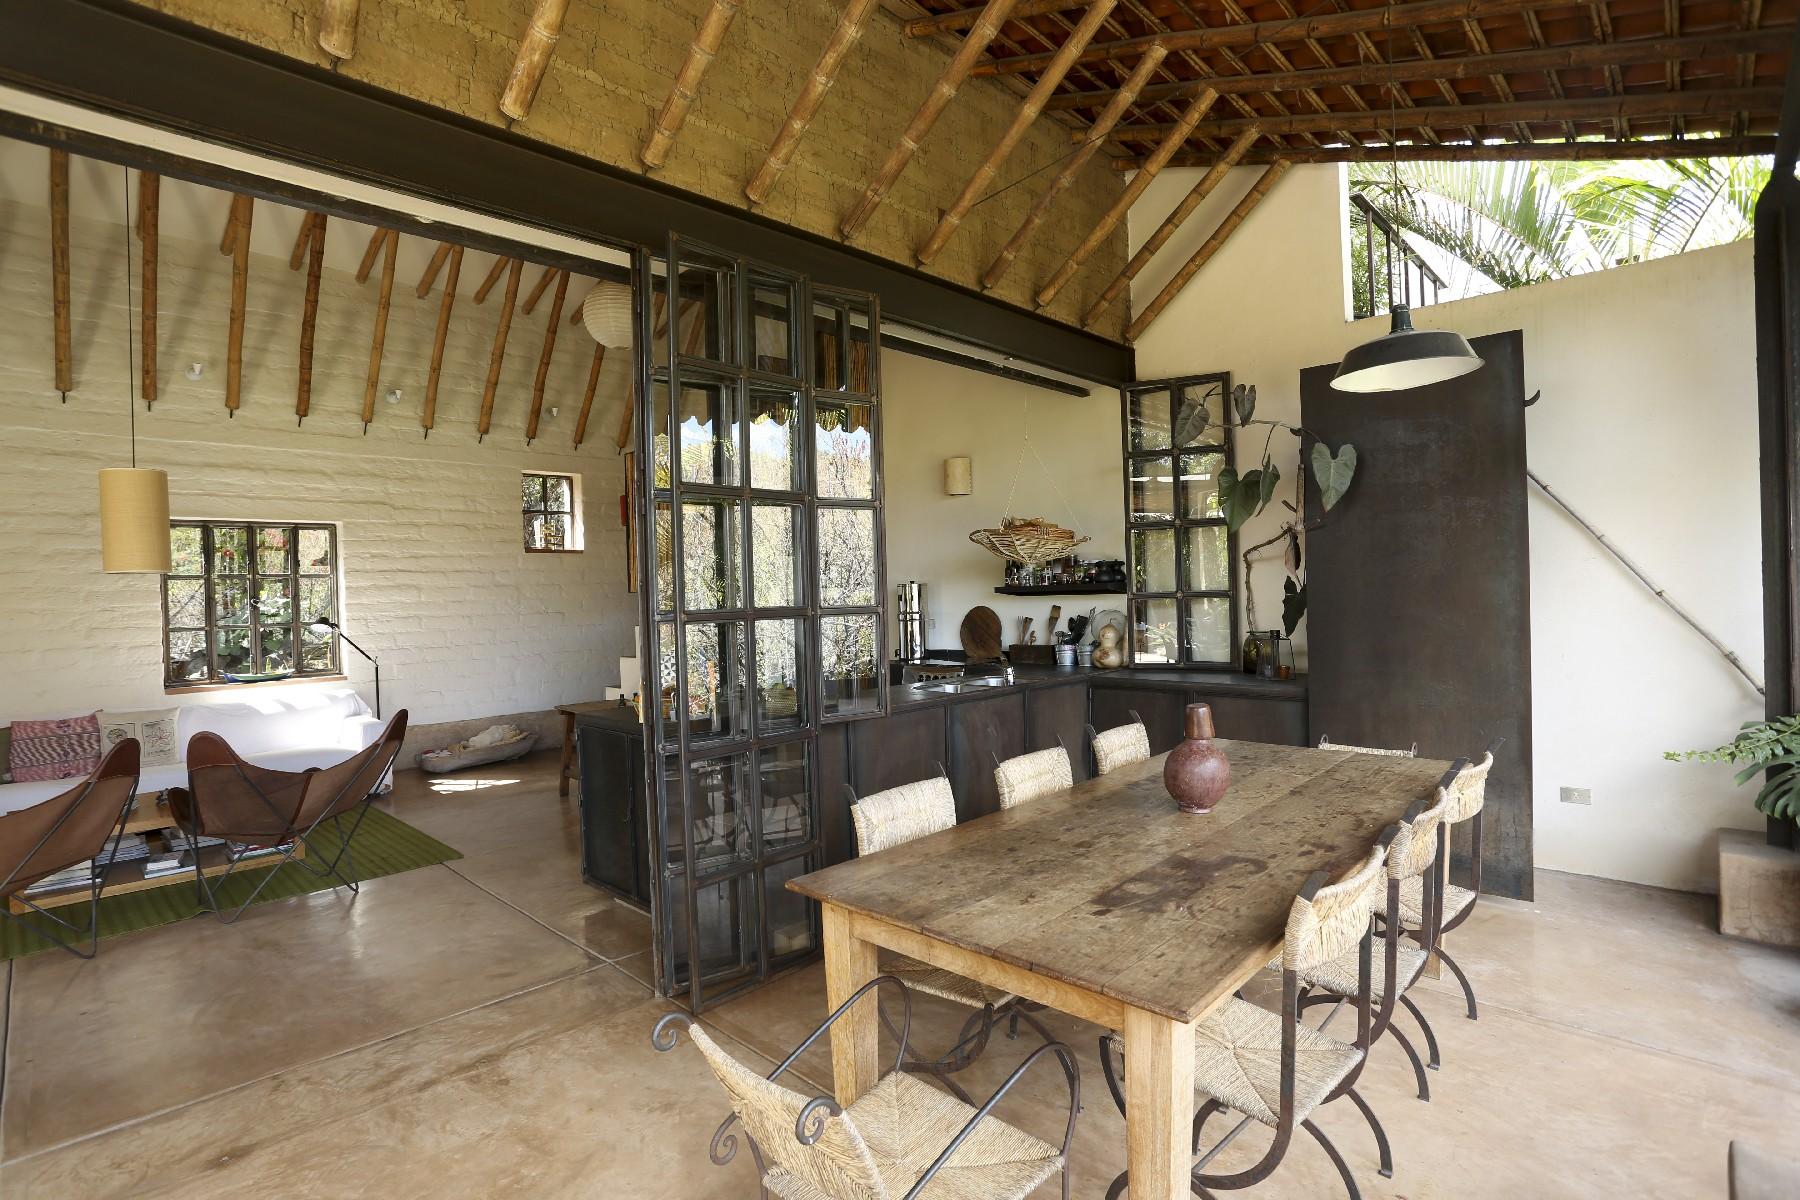 Additional photo for property listing at Hacienda Agua del Prior, Malinalco, Estado de Mexico, CDMX Agua del Prior Malinalco Federal District, Mexico Df 52440 México